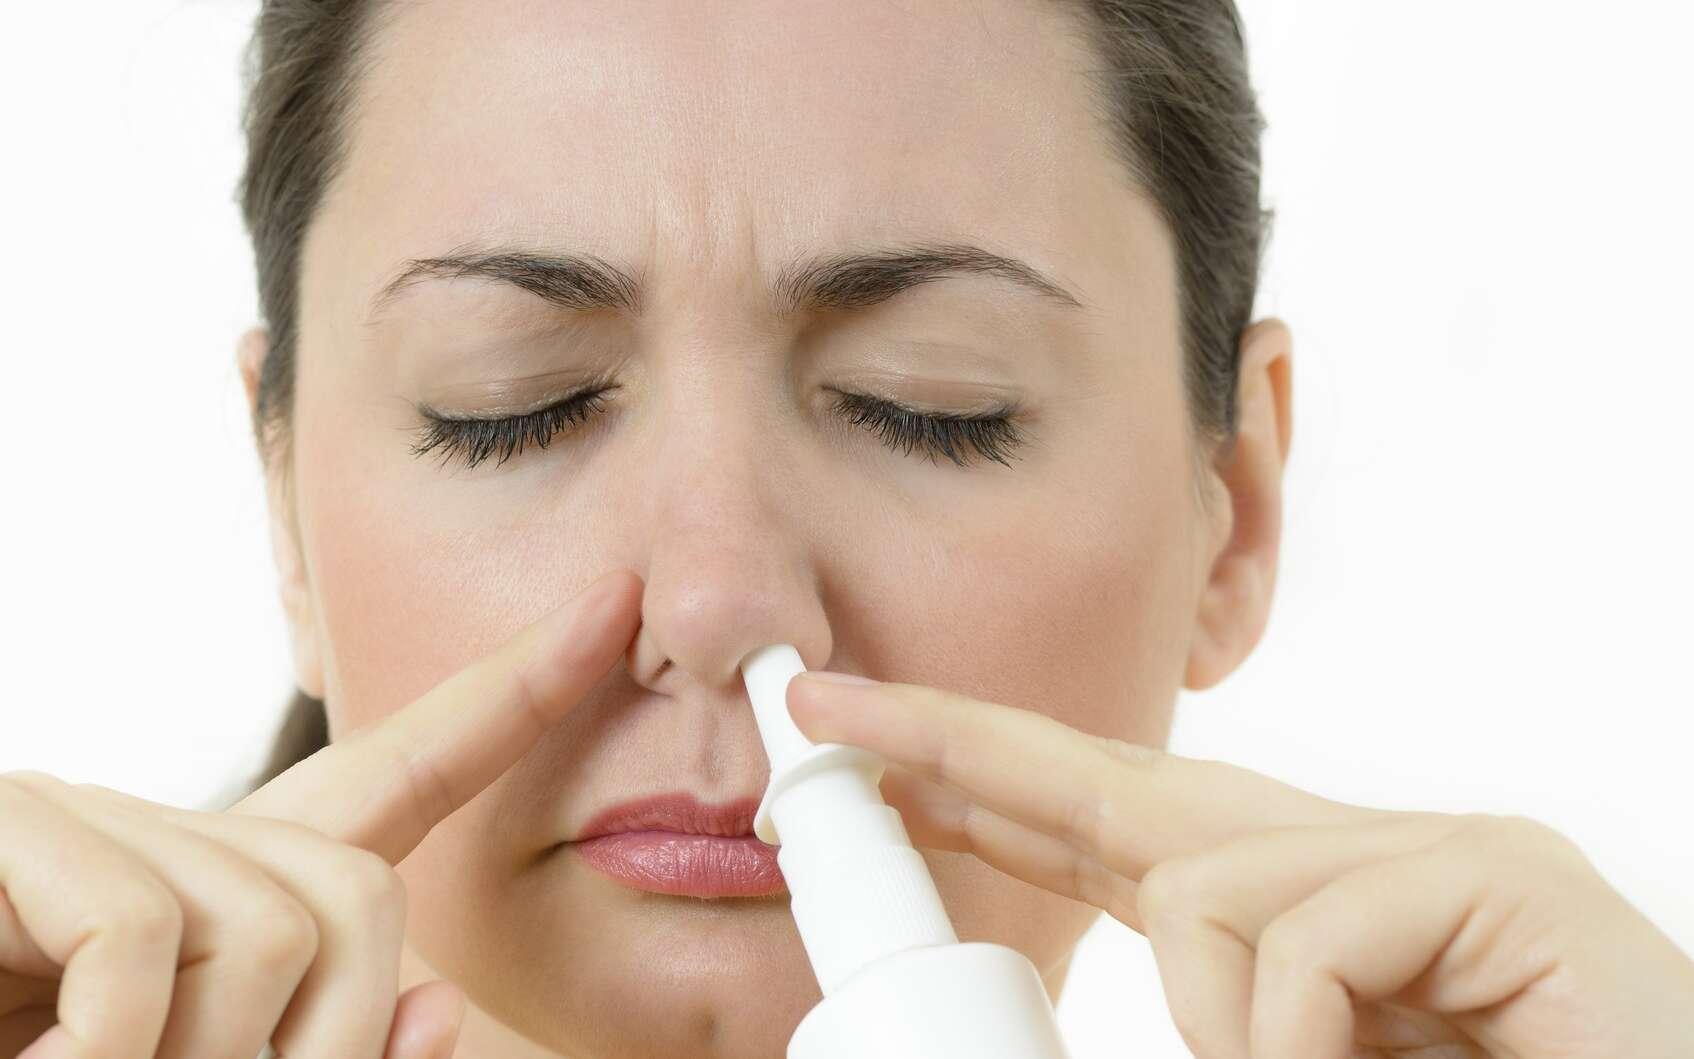 Le médicament sera proposé sous la forme d'un spray nasal. © oneblink1, Fotolia